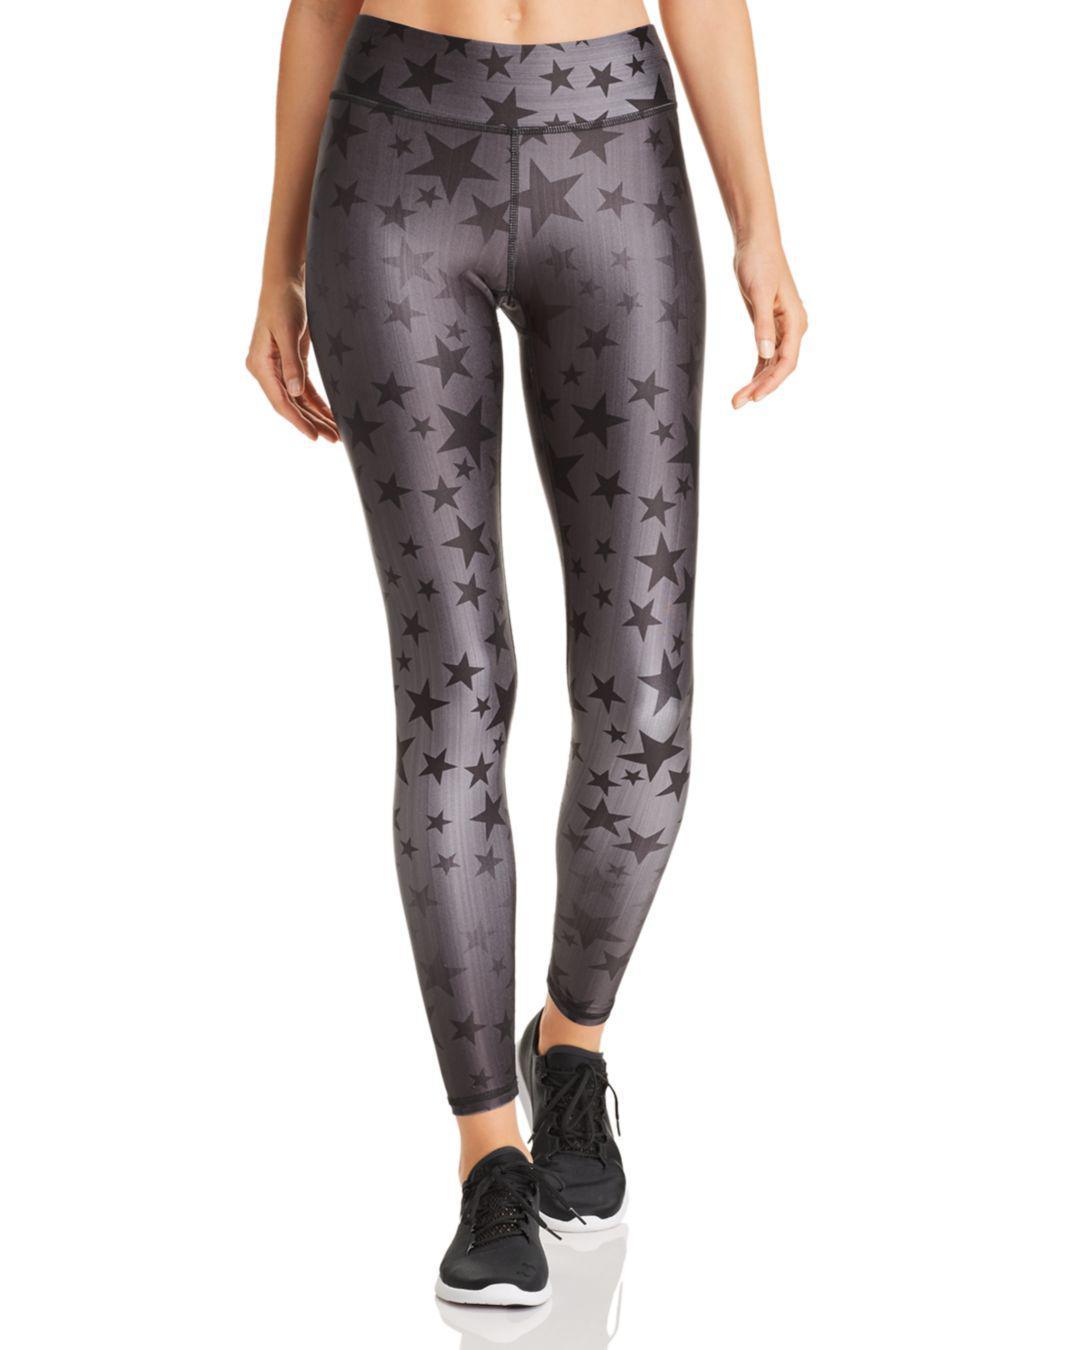 a9b90f4490a70 Lyst - Terez Steel Star Print Leggings in Gray